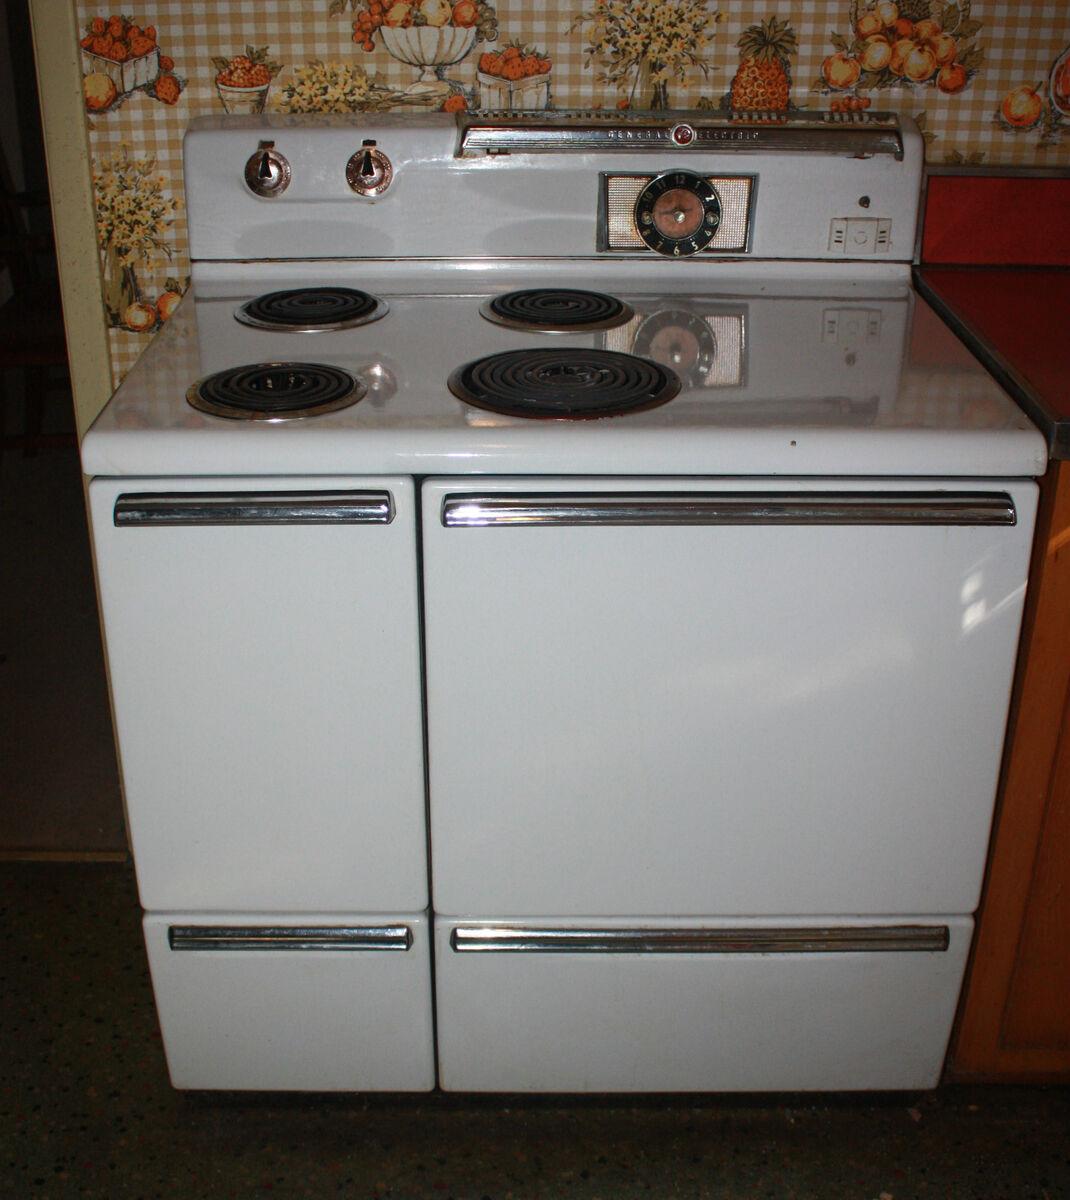 Mid Century Modern Oven ~ Vintage white stove mid century modern s ge oven